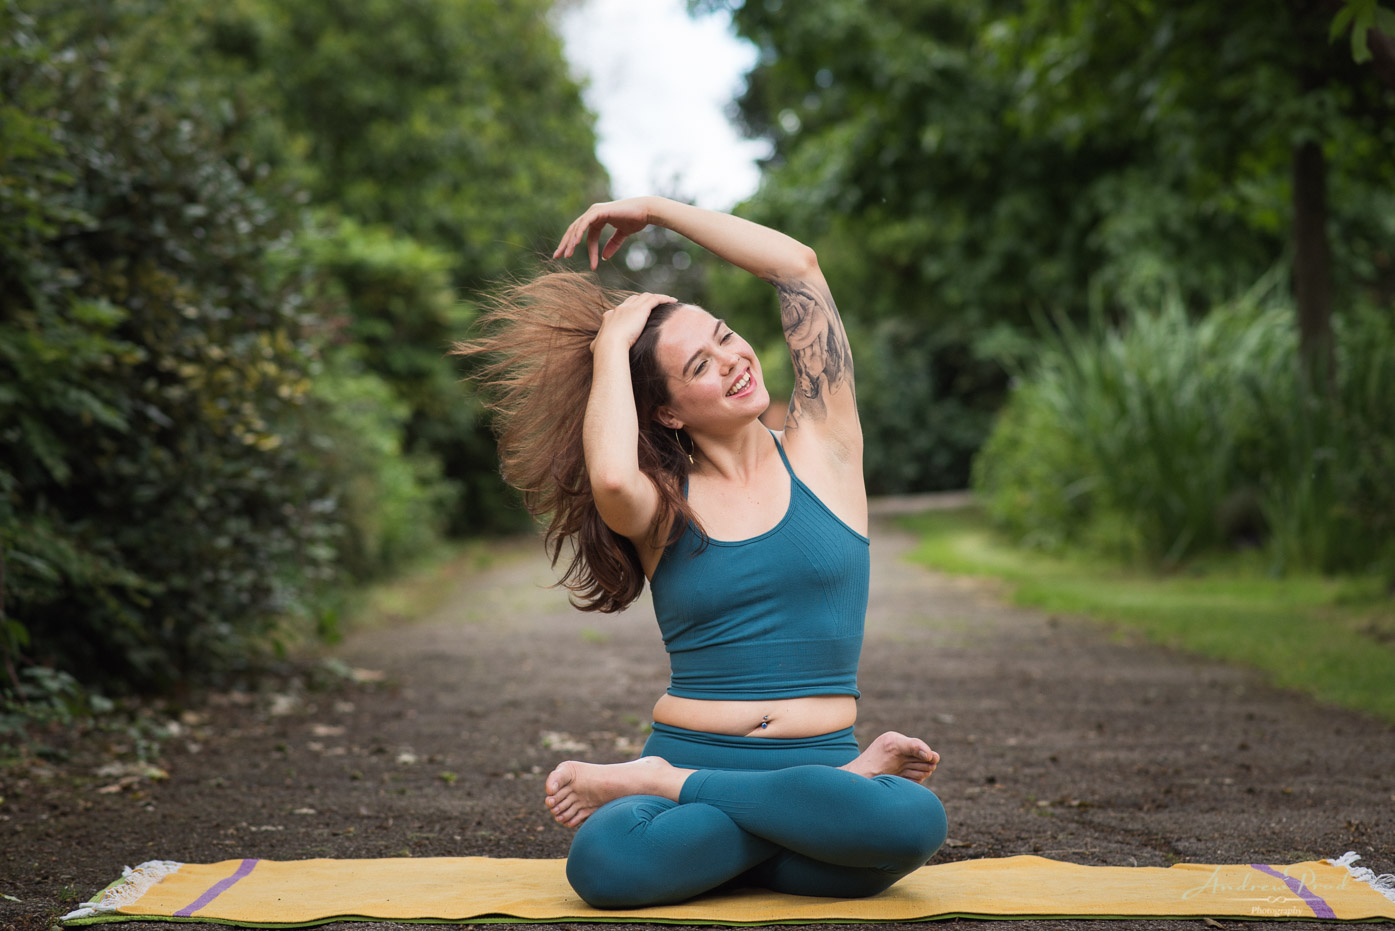 Lifestyle yoga portraits